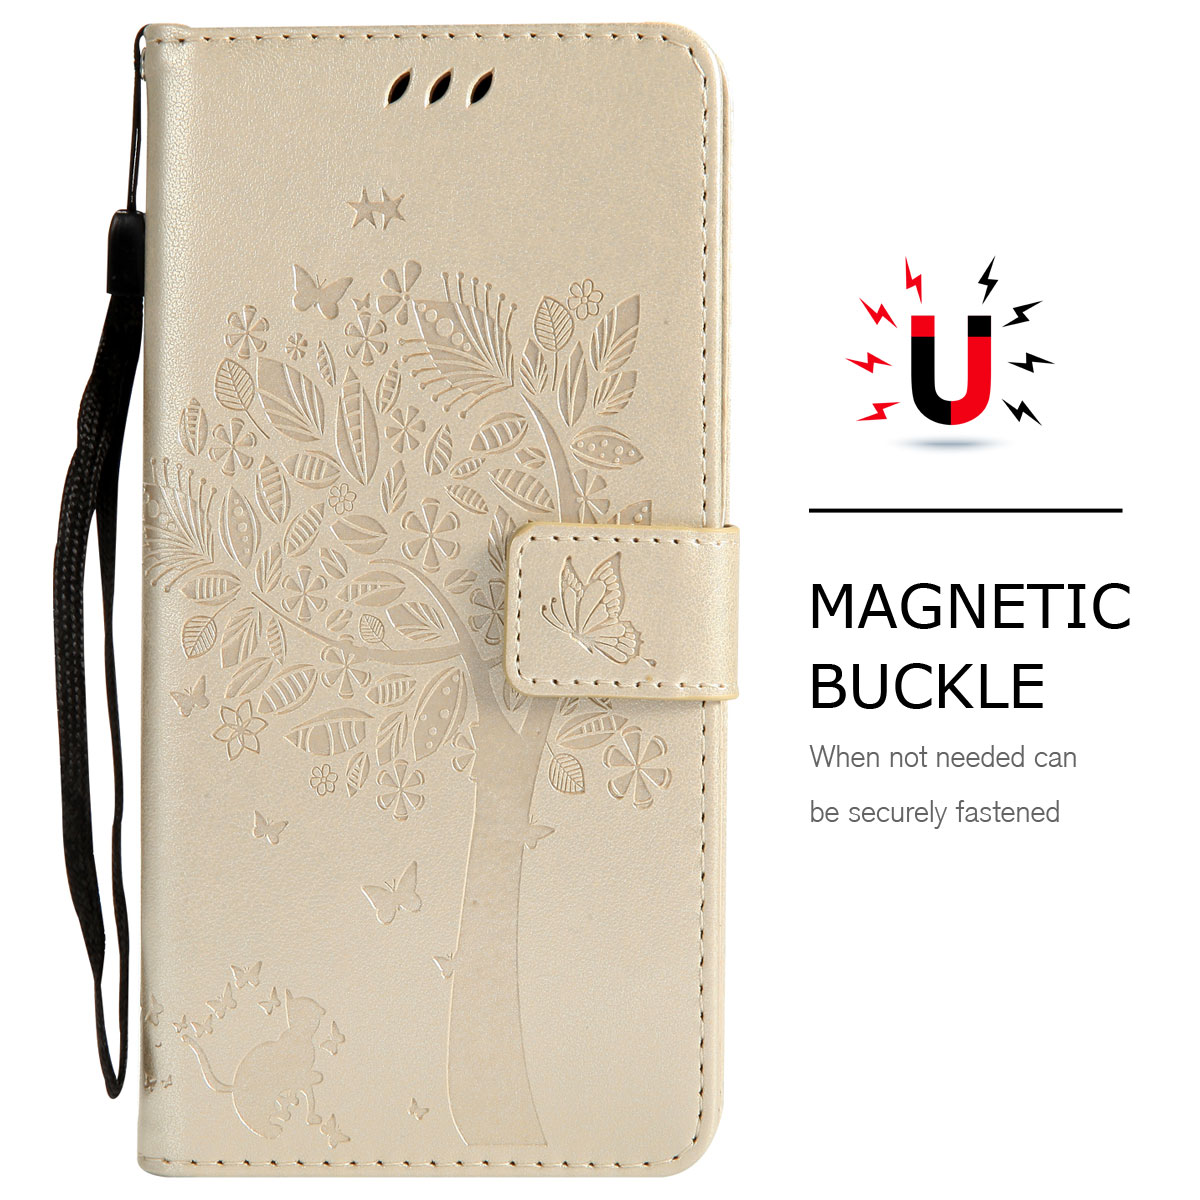 Magnetic-Leather-Credit-Card-Holder-Flip-Case-Cover-For-Google-Pixel-2-2-XL thumbnail 51